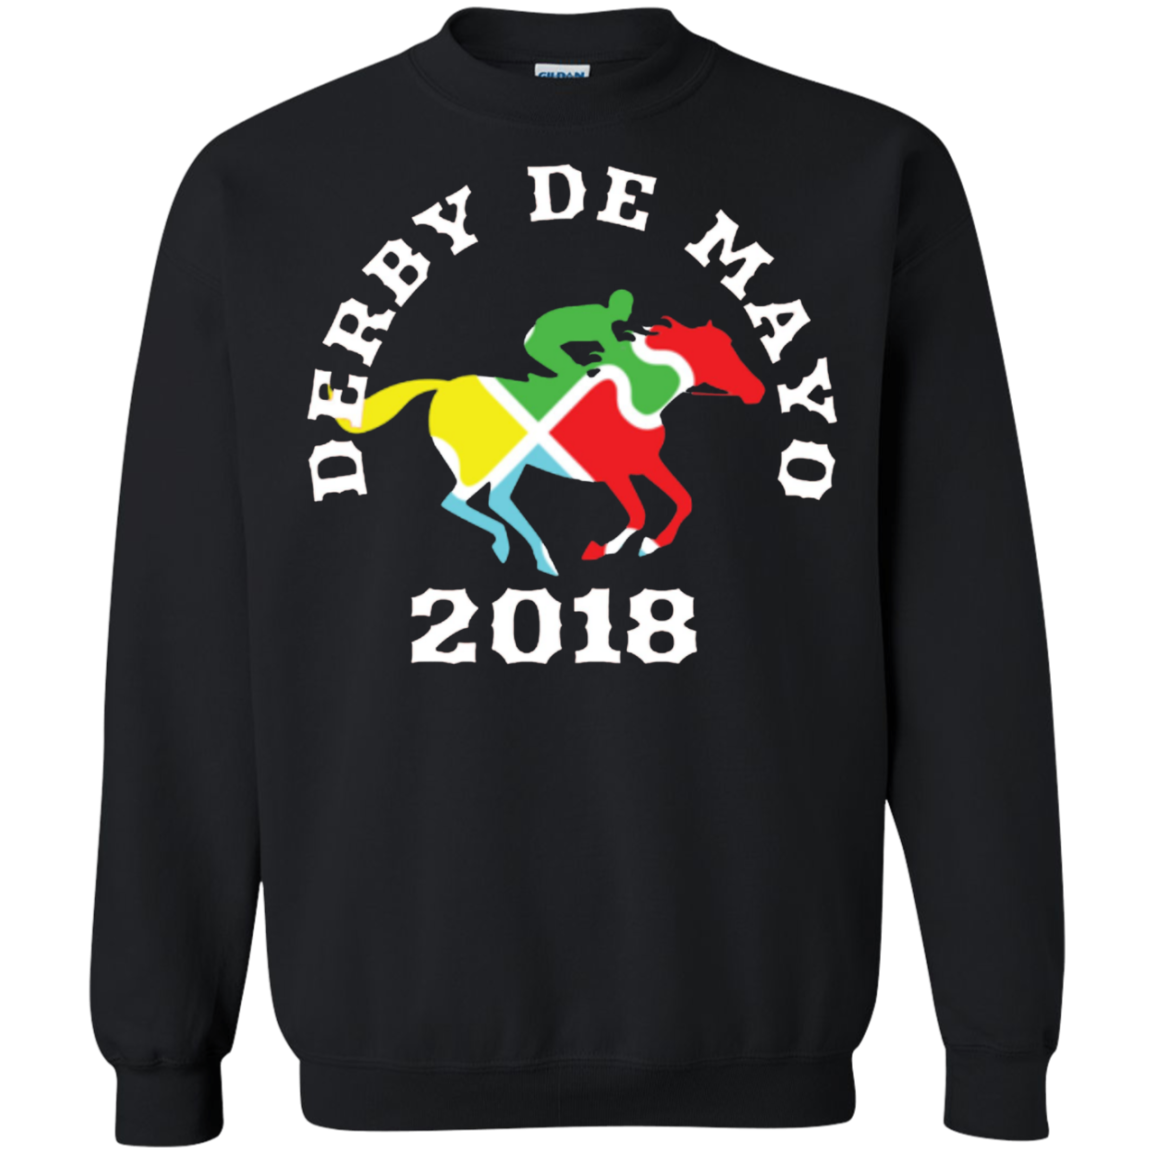 Kentucky Horse Race Mexican shirt Derby De Mayo Sweatshirt Men